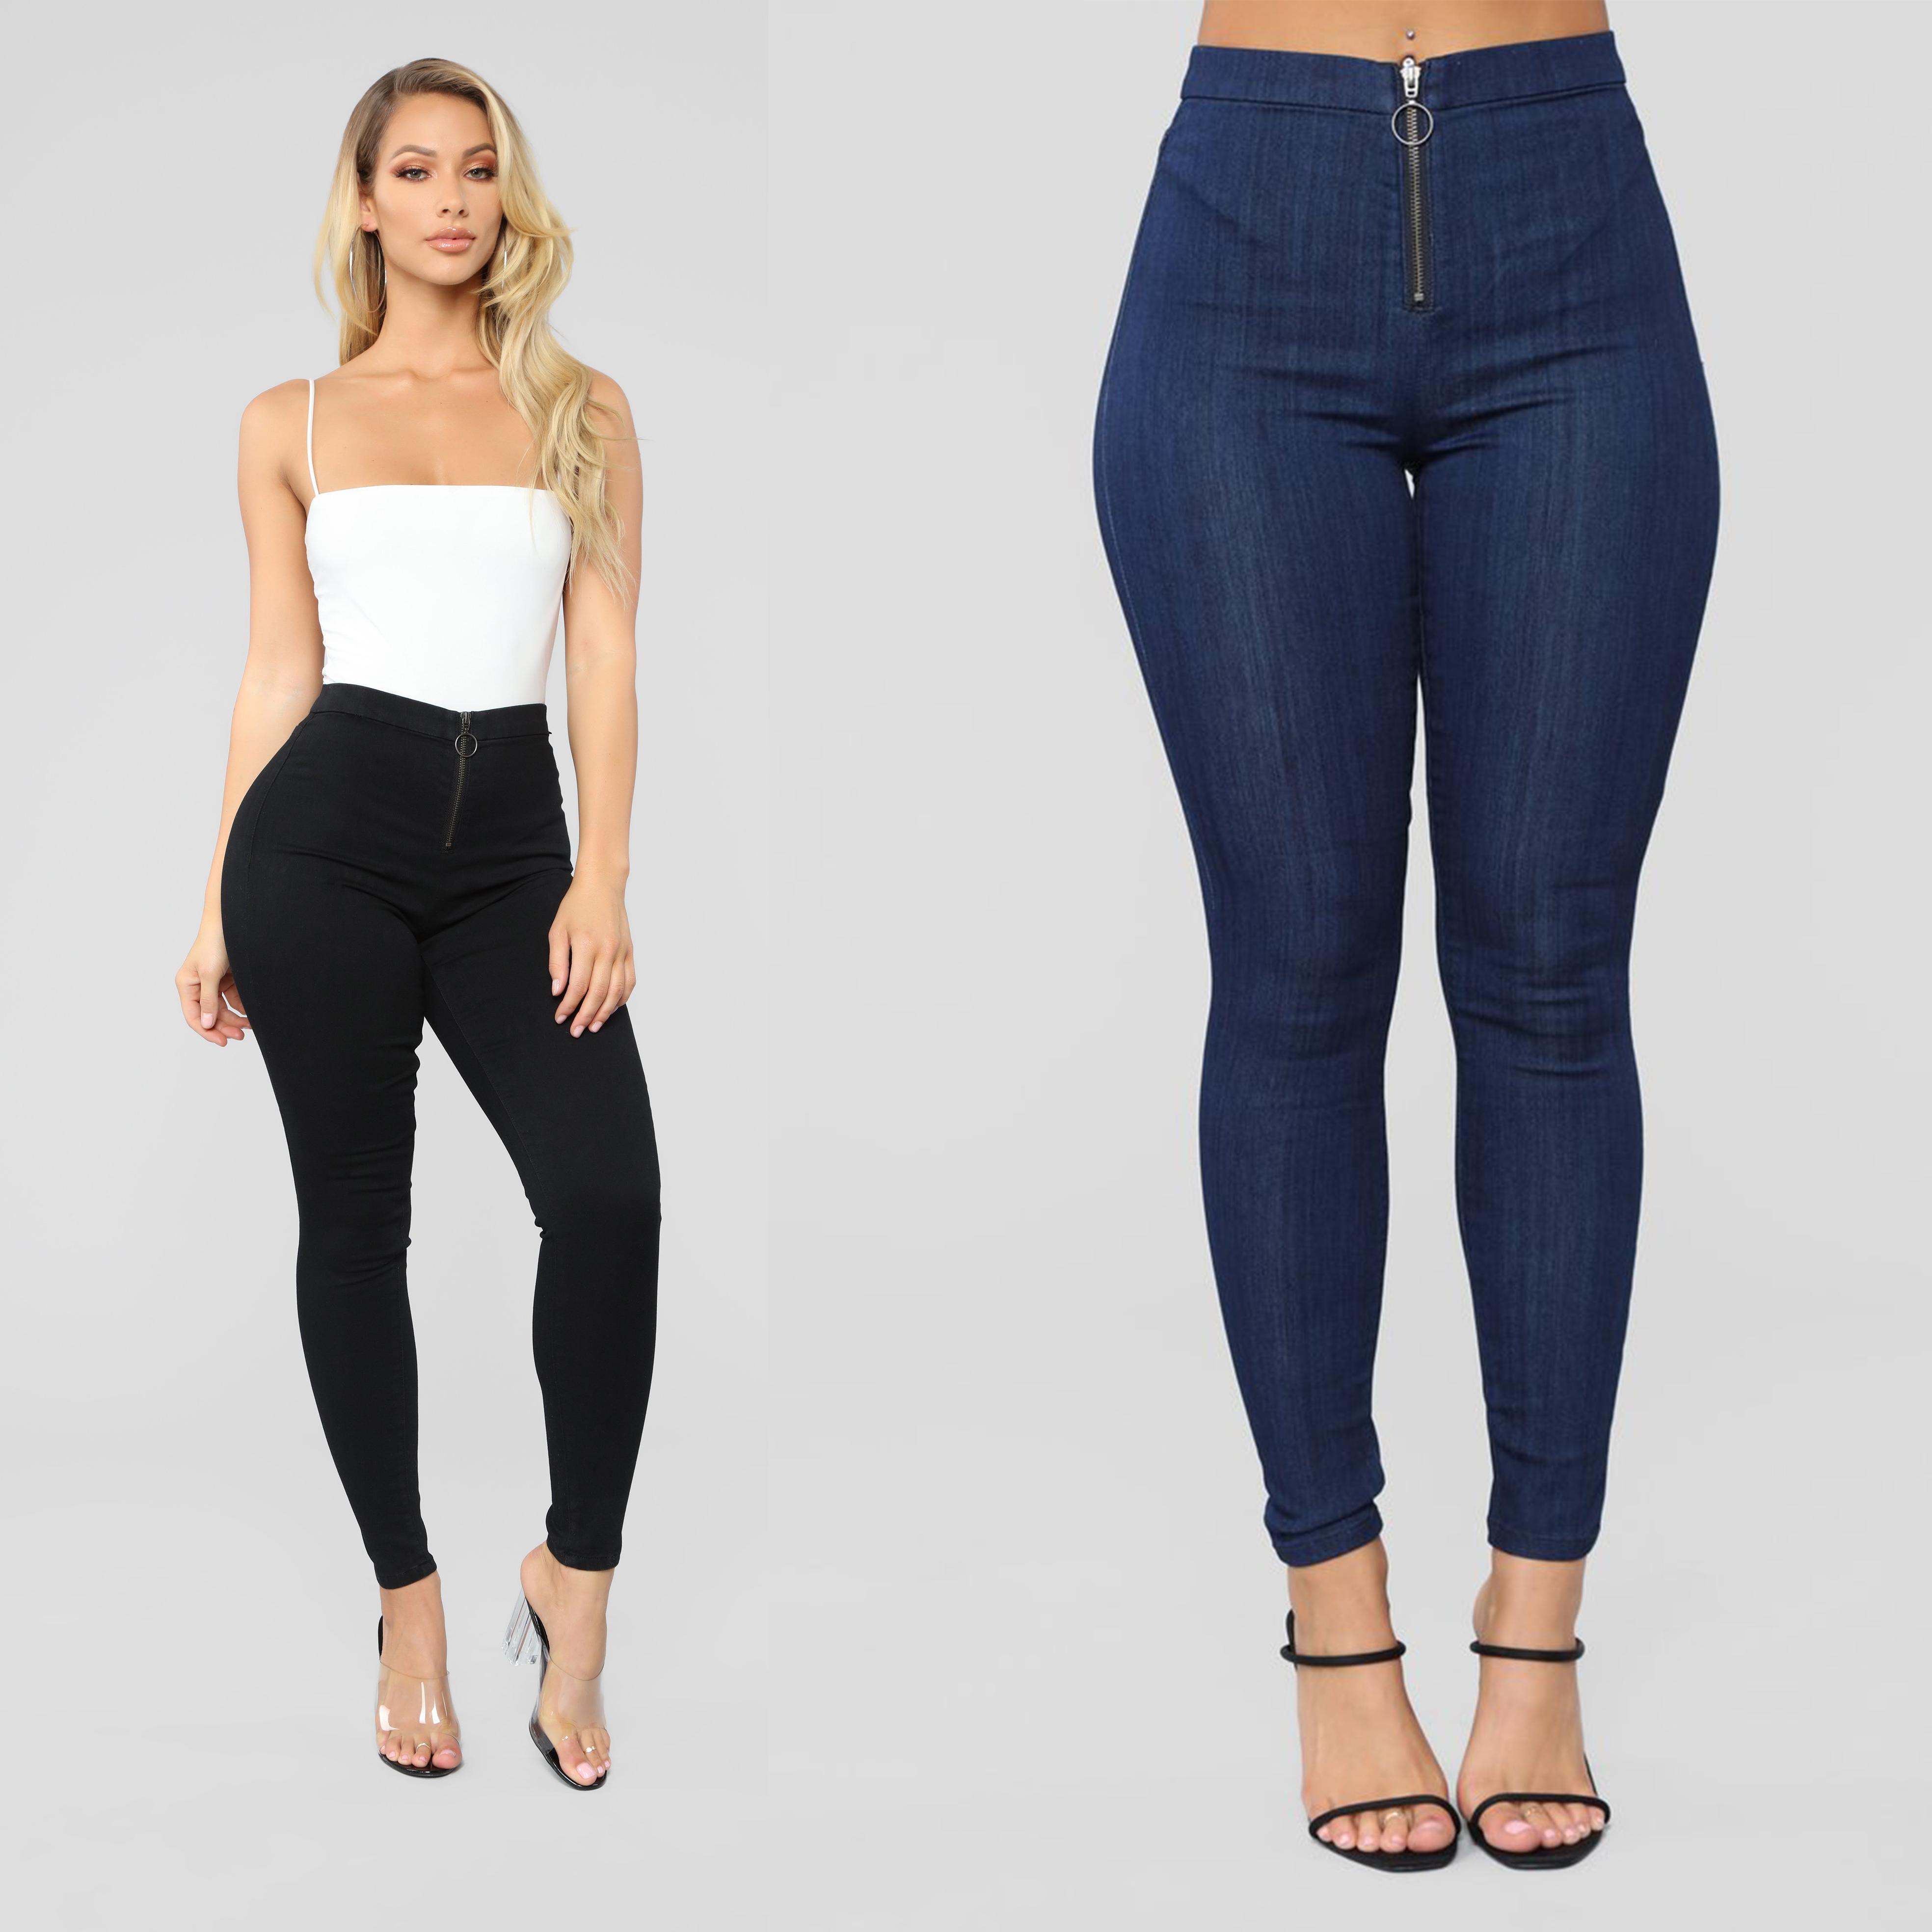 Straight Leg Stretch Denim Jeans High Waist Faded Indigo Dark Blue NEW 14-22